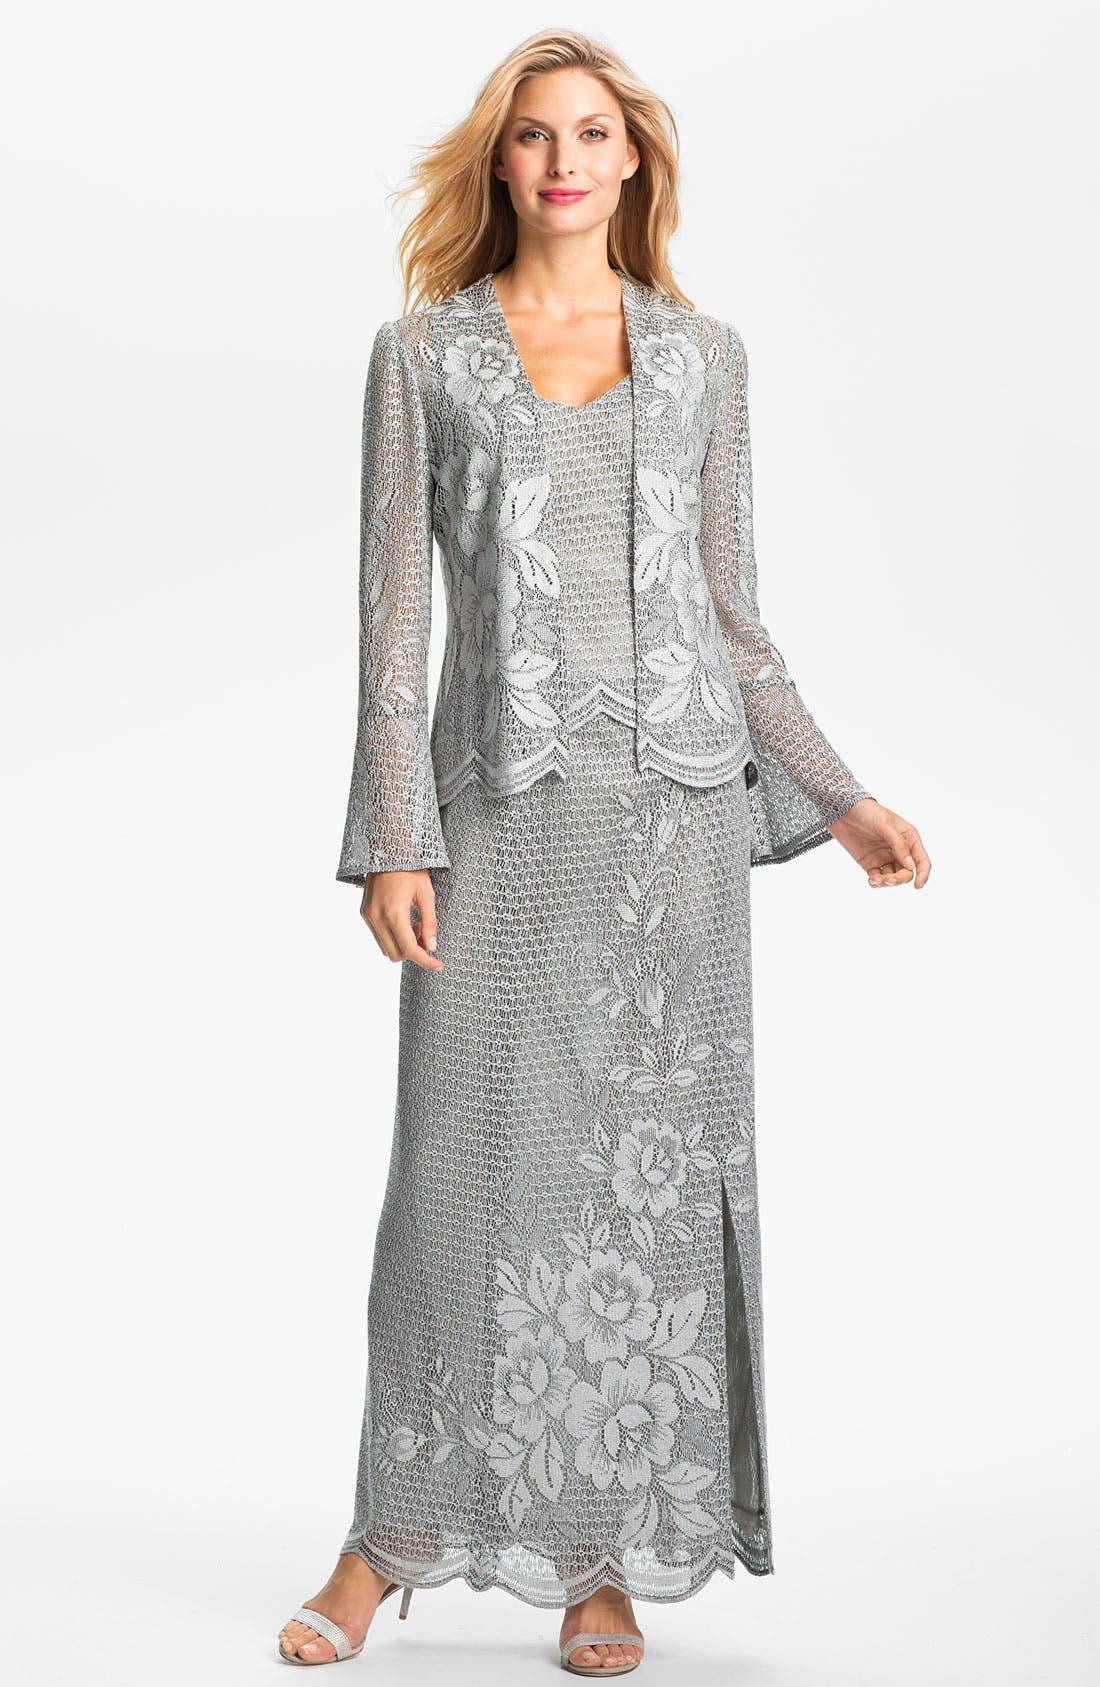 Alternate Image 1 Selected - Damianou Metallic Lace Tank, Skirt & Bell Cuff Jacket